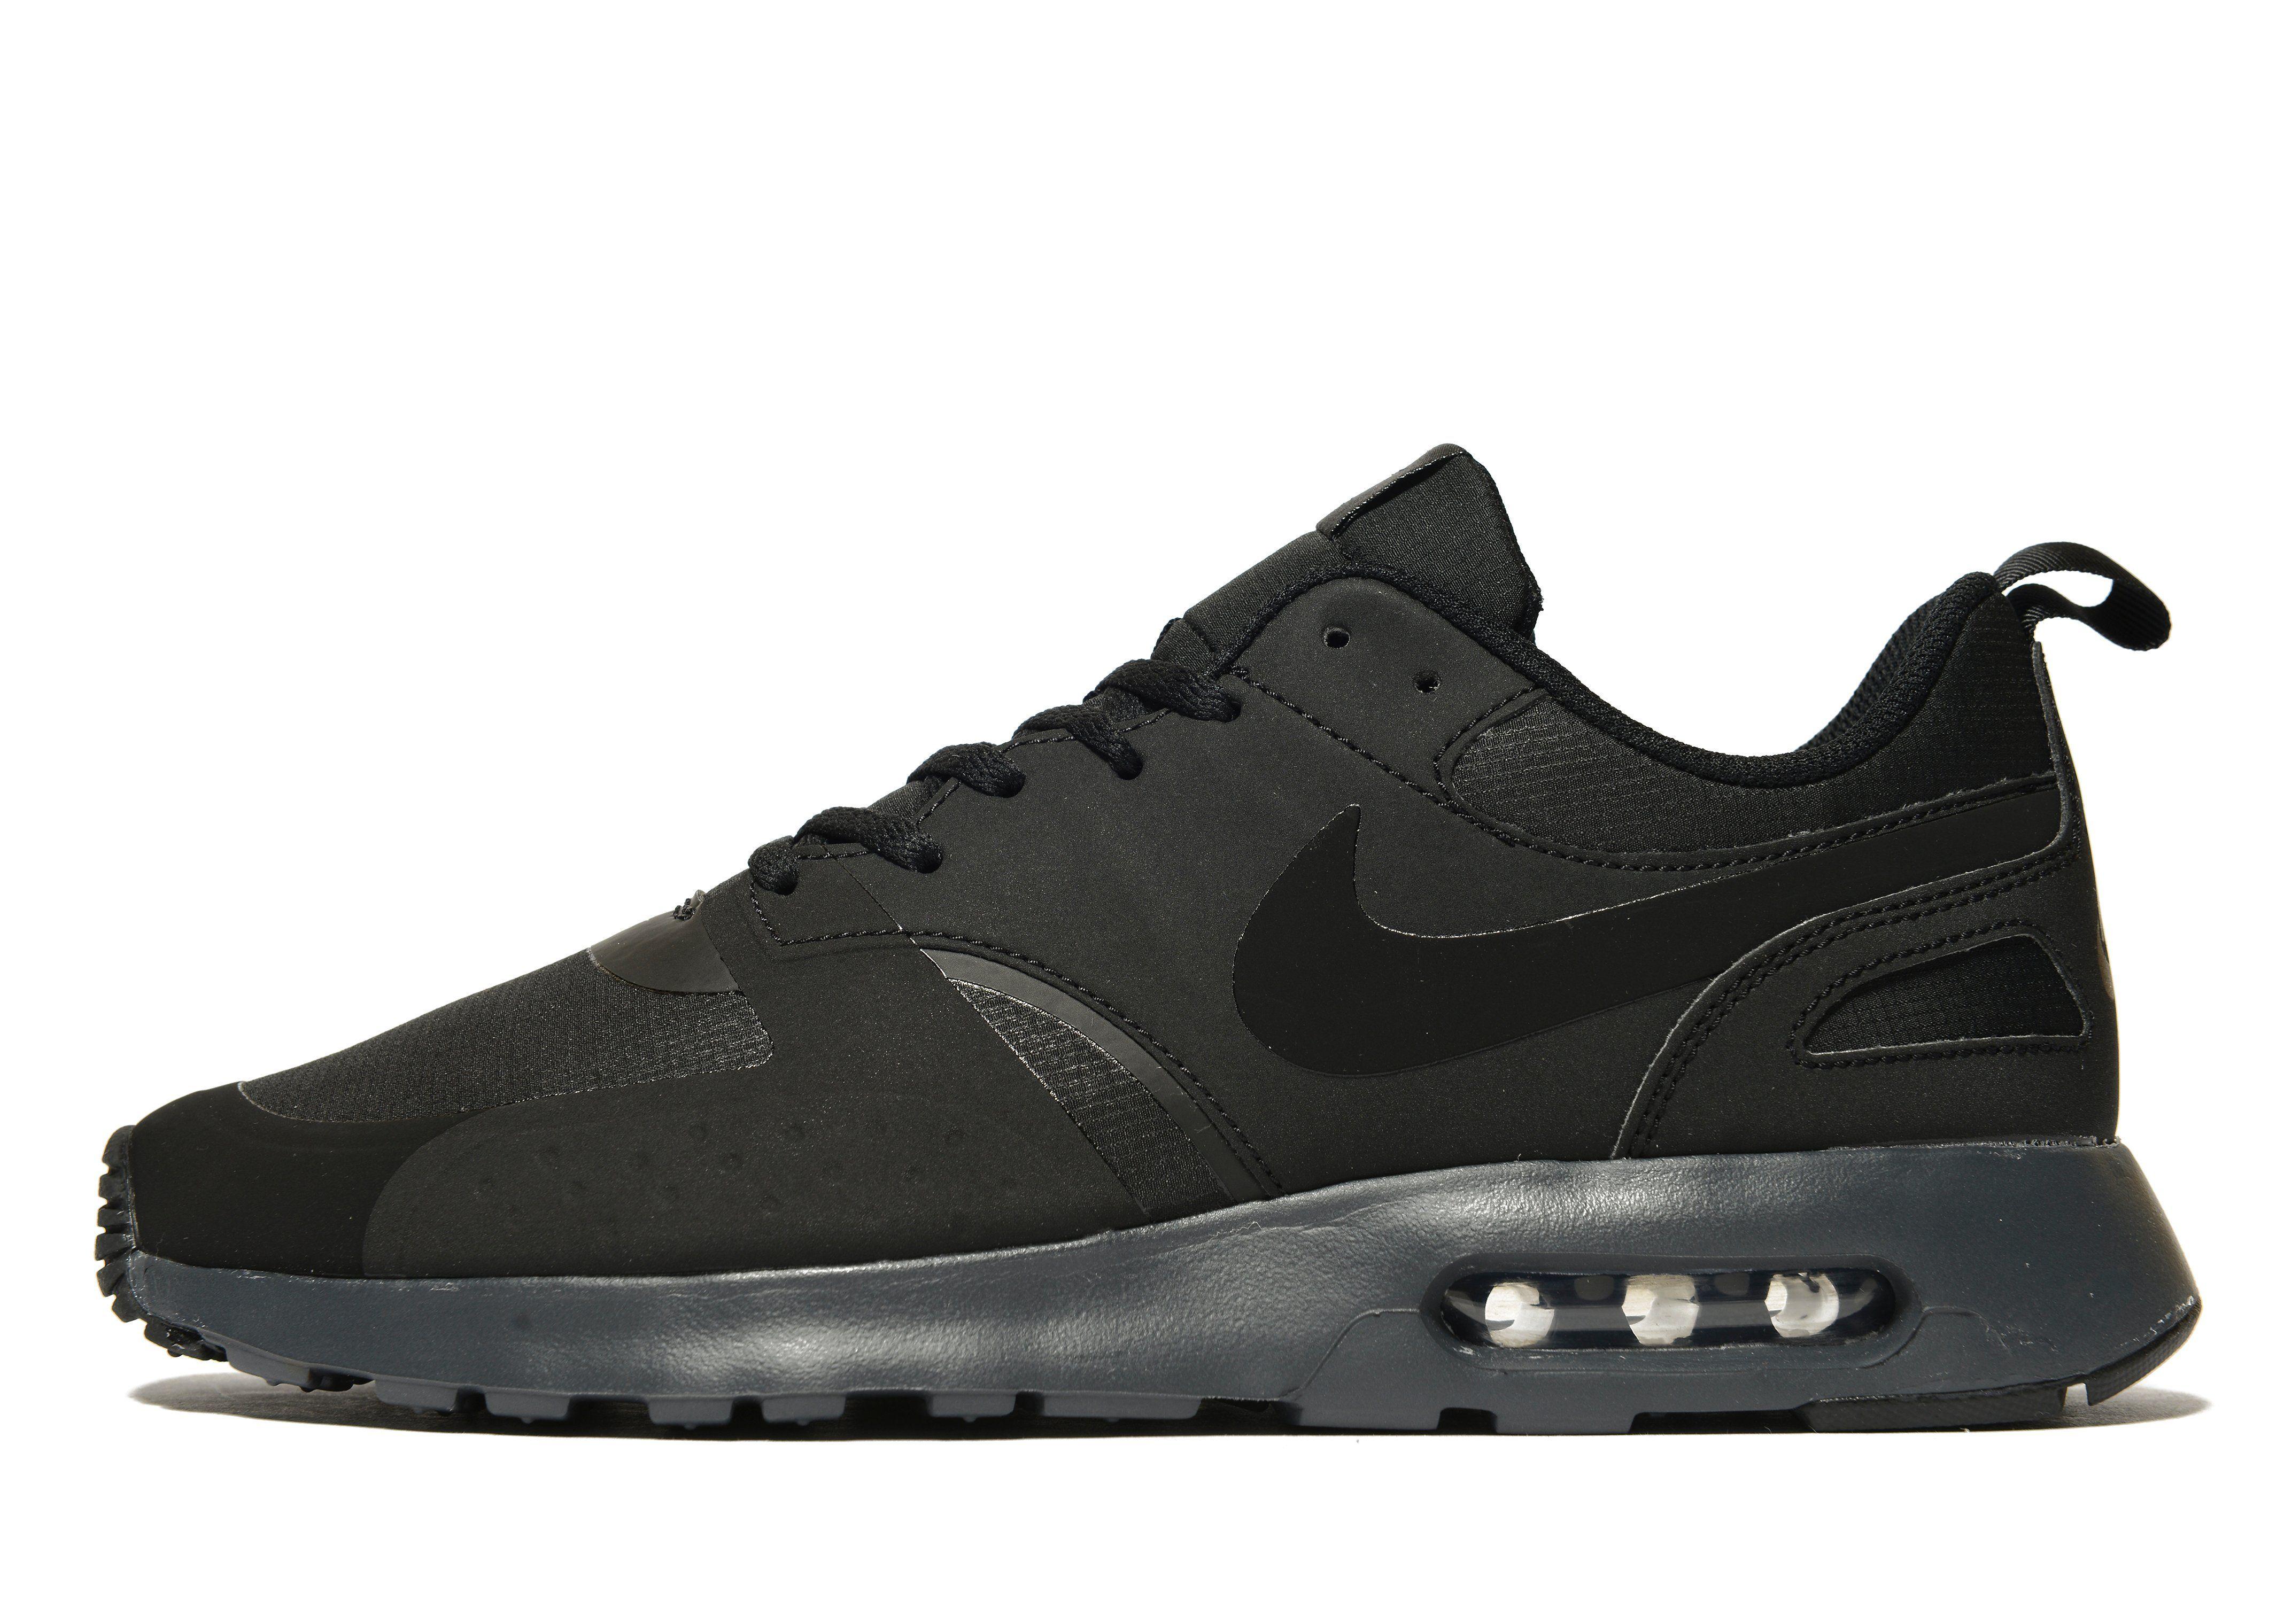 Nike Air Max Vision